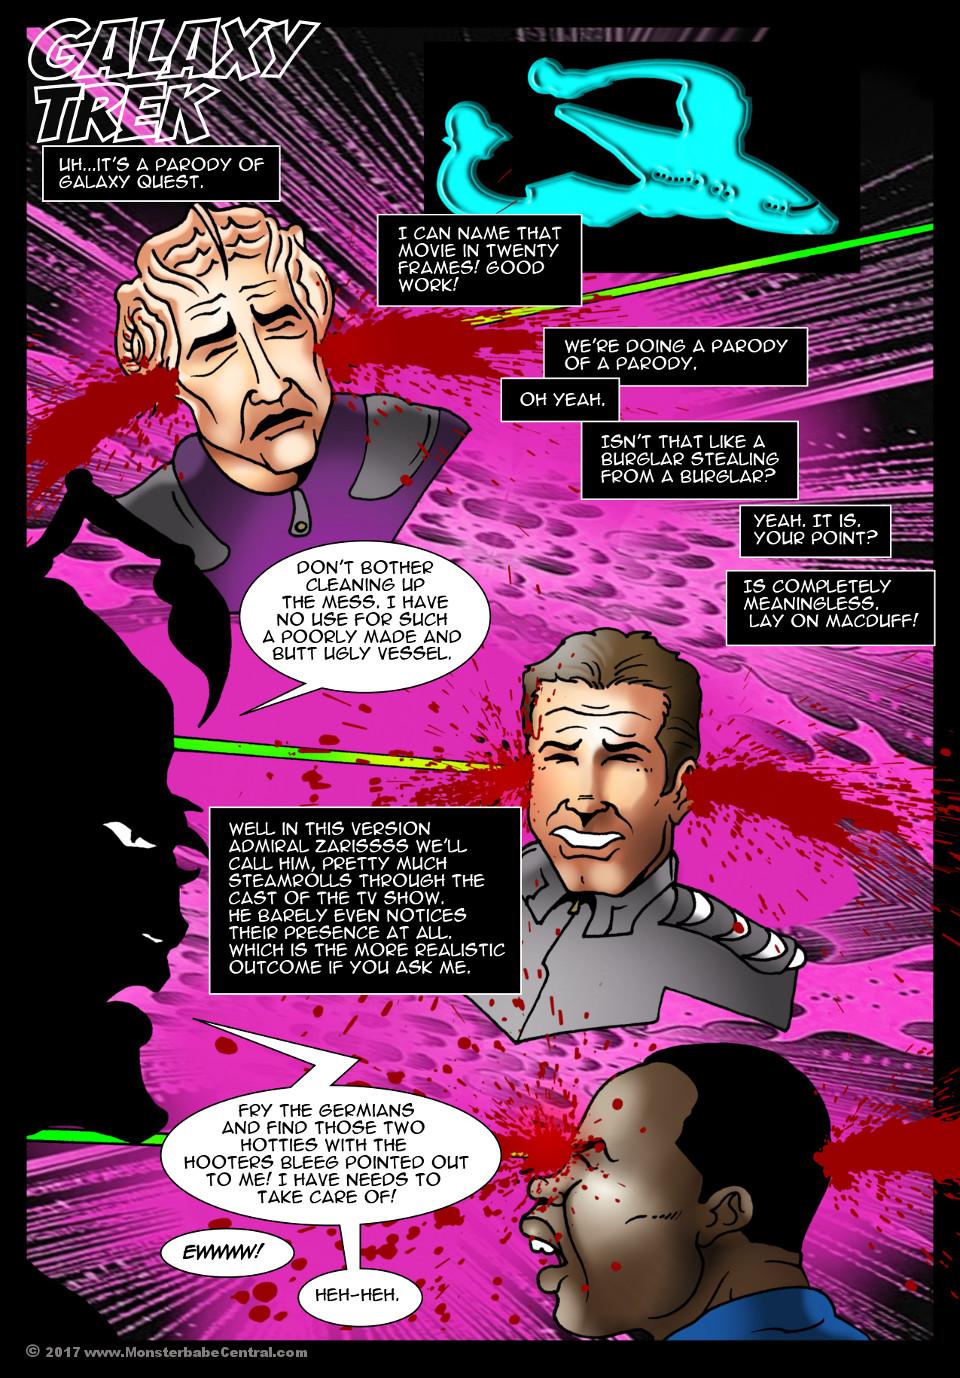 Goodcomix.tk Star Trek - [MonsterBabeCentral] - Galaxy Trek